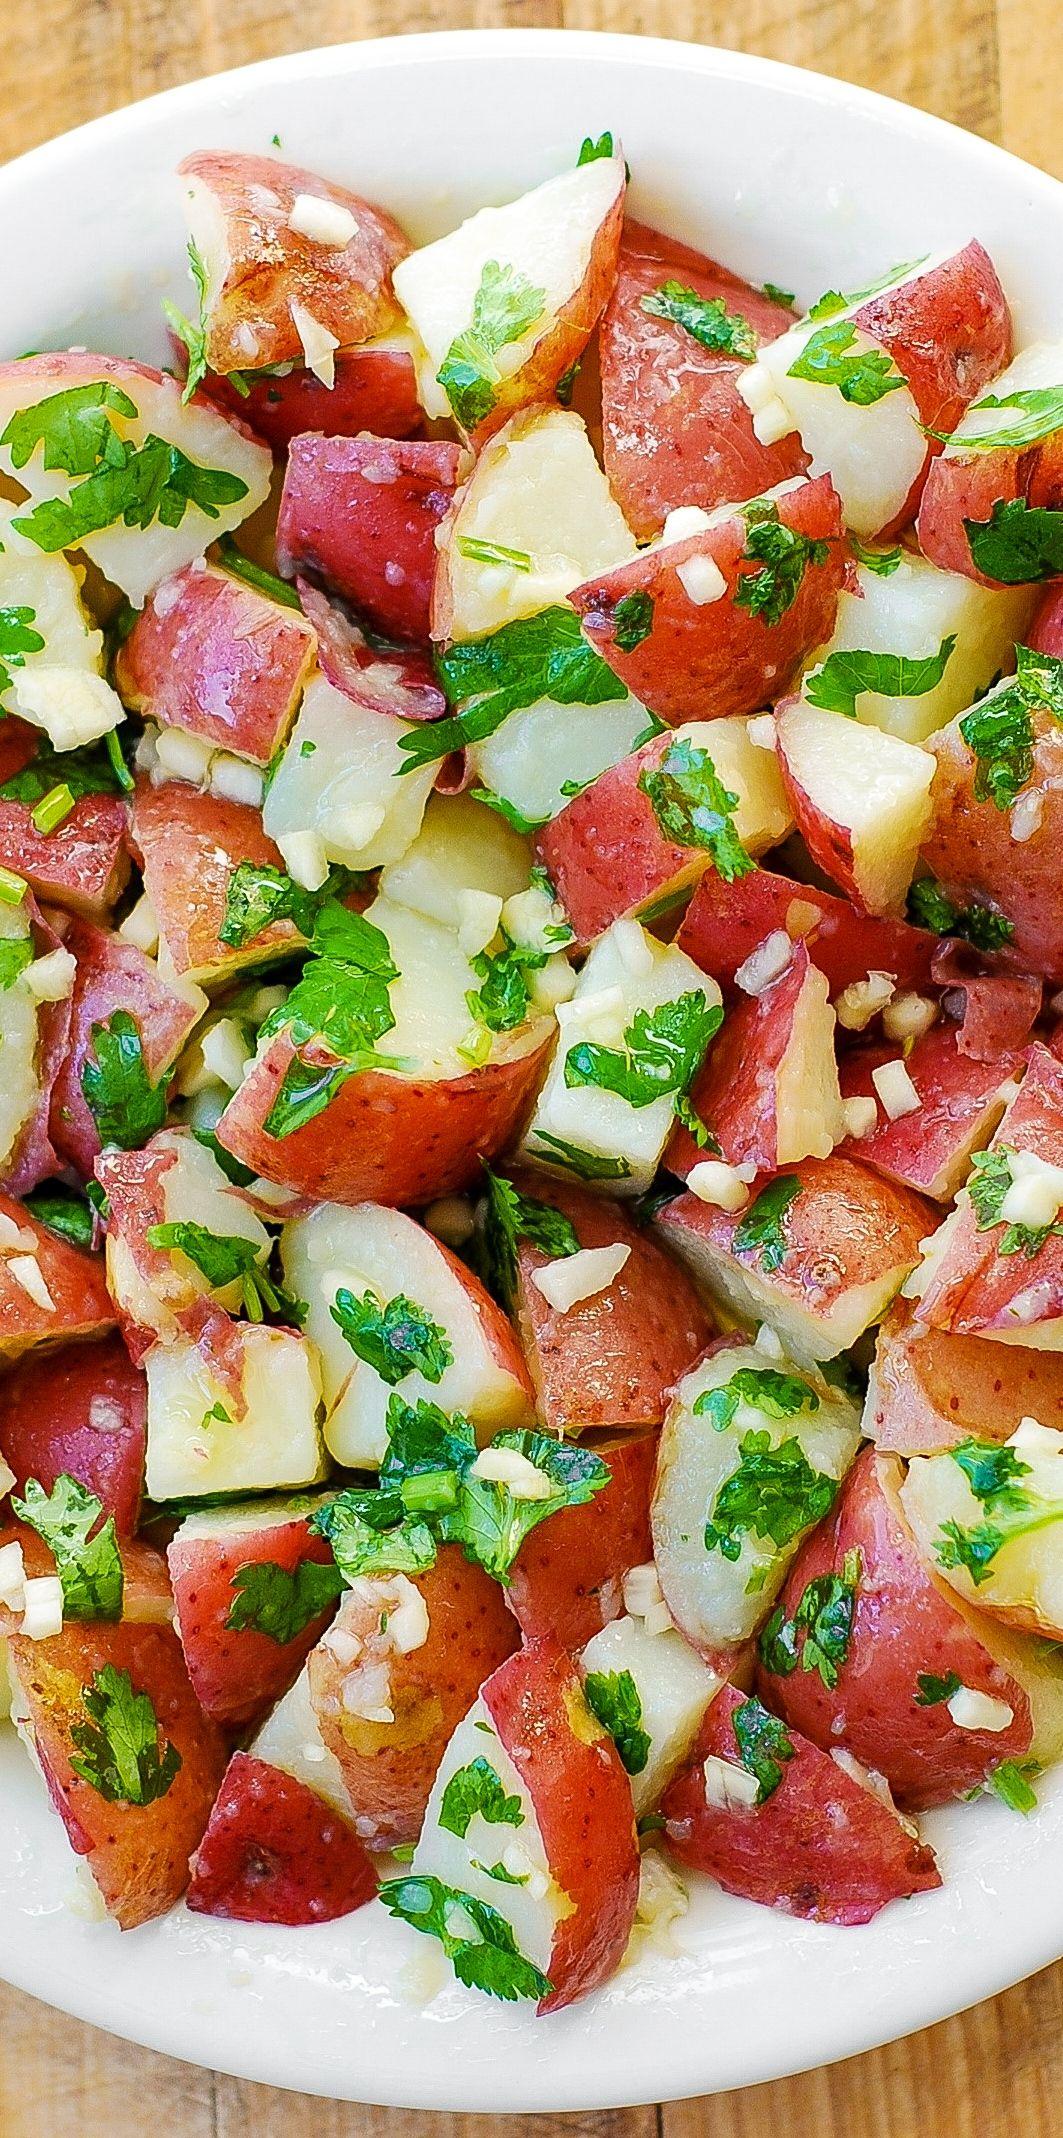 Cilantro Lime Potato Salad Olive Oil Freshly Squeezed